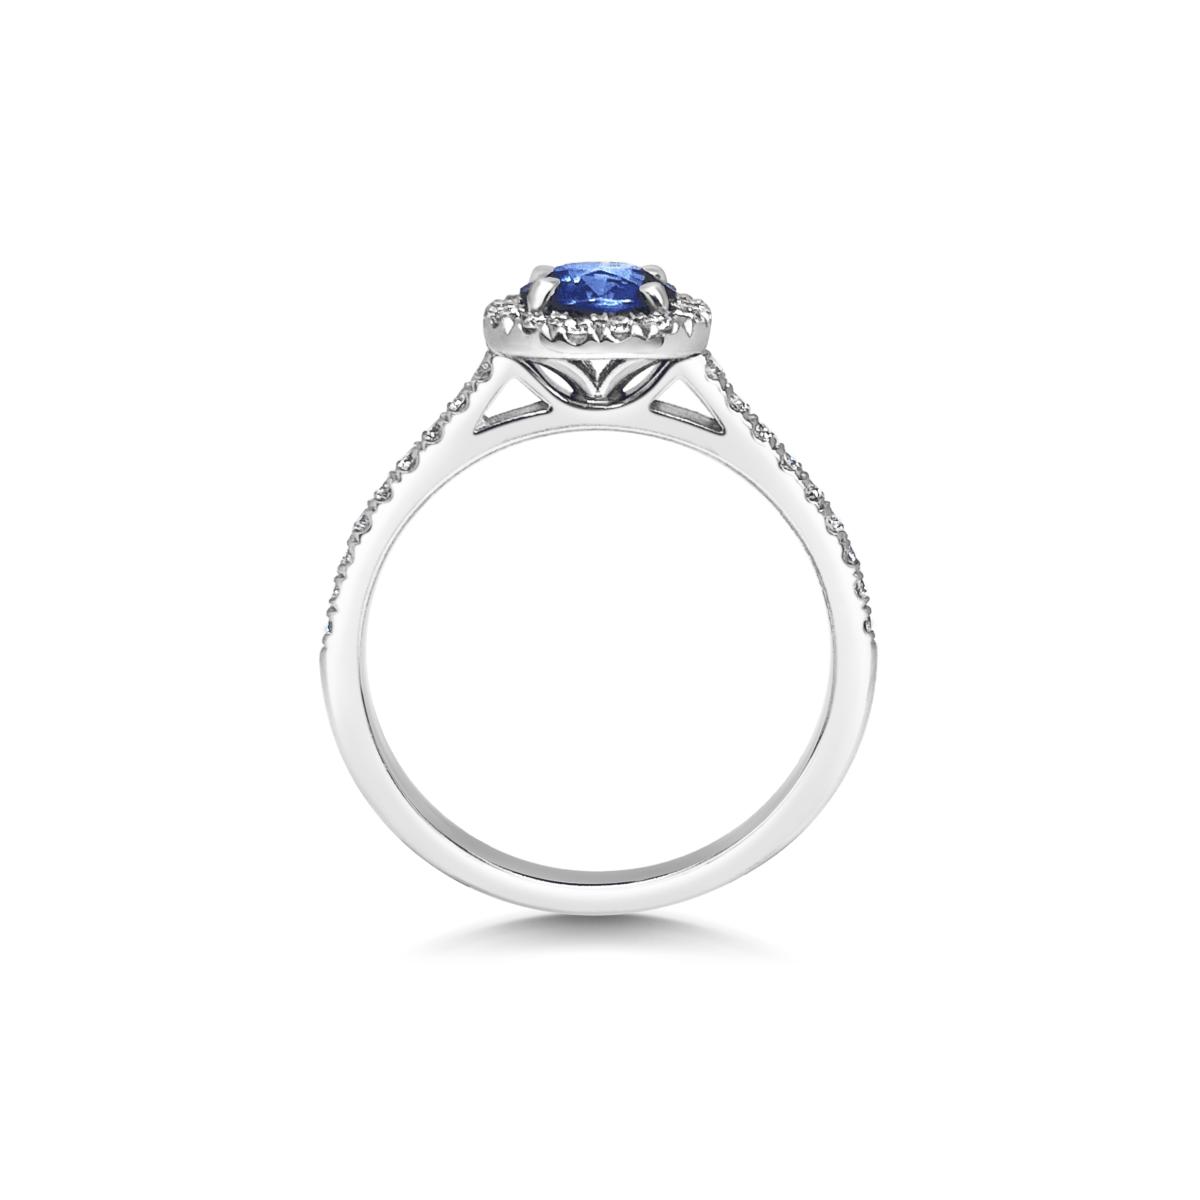 Heidi Blue Sapphire Cushion Cut Halo Microset Engagement Ring Side View